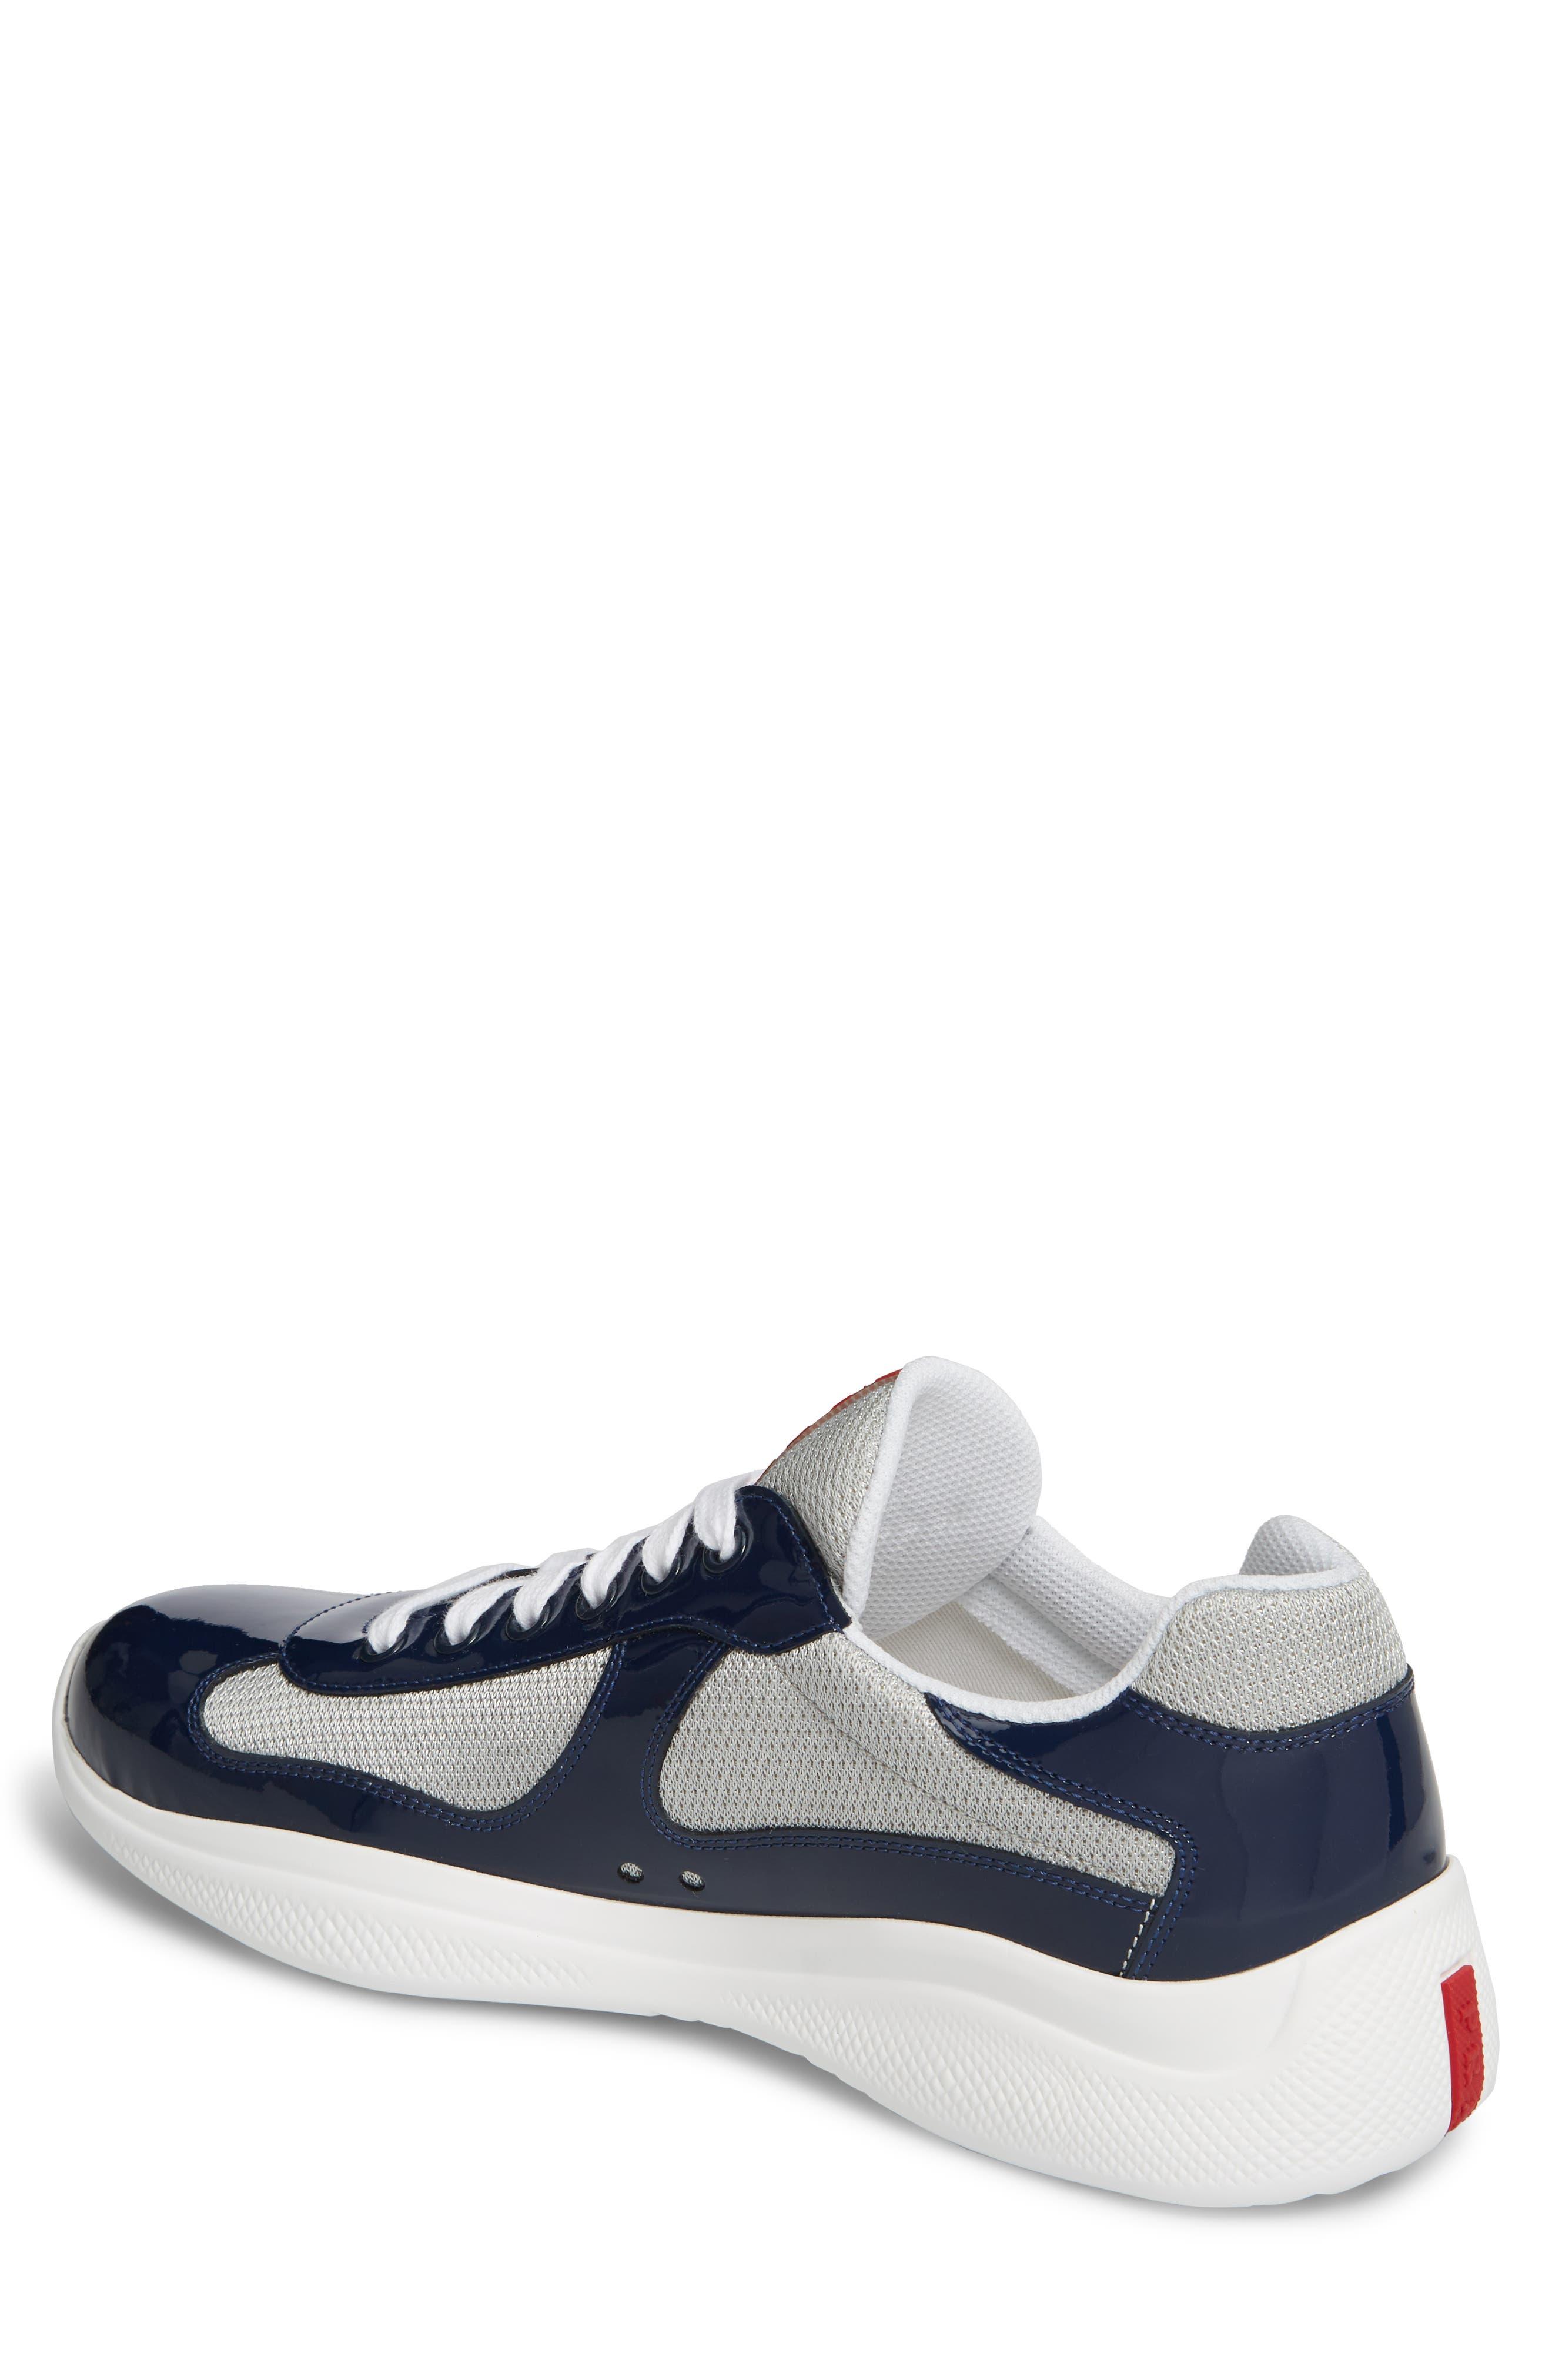 buy online 77a8b 24318 Prada Shoes for Men   Nordstrom